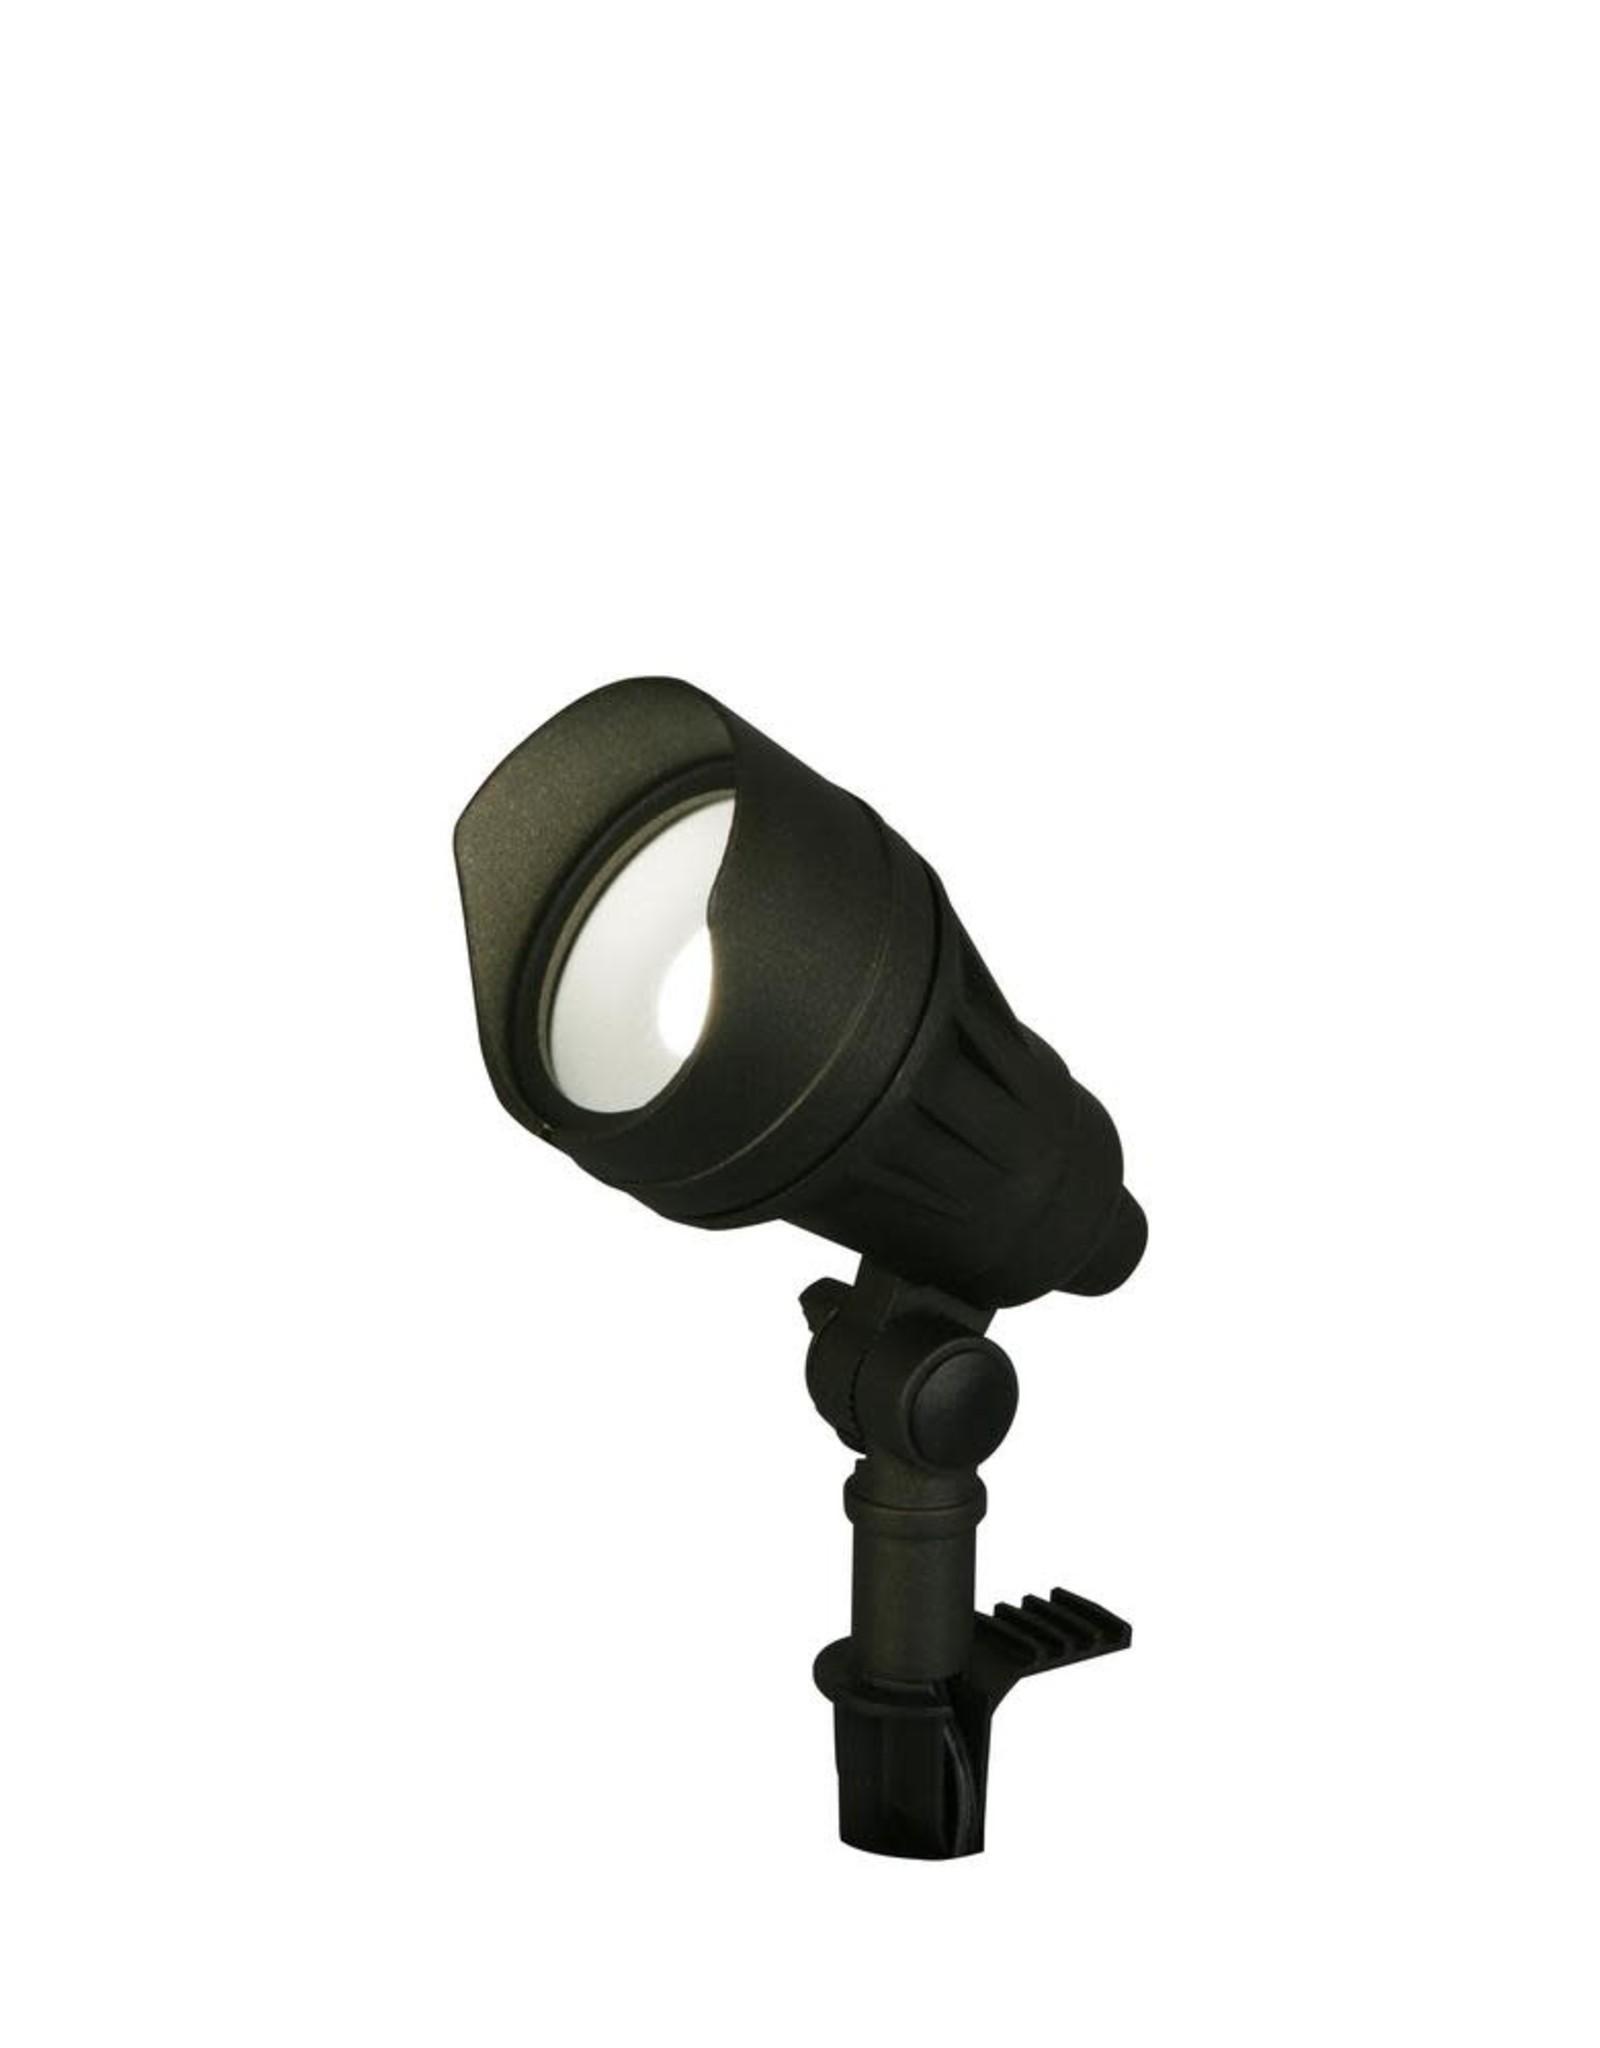 Hampton Bay 9.8-Watt Millennium Black Outdoor Integrated LED Landscape Flood Lights with Adjustable Light Color (8-pack)